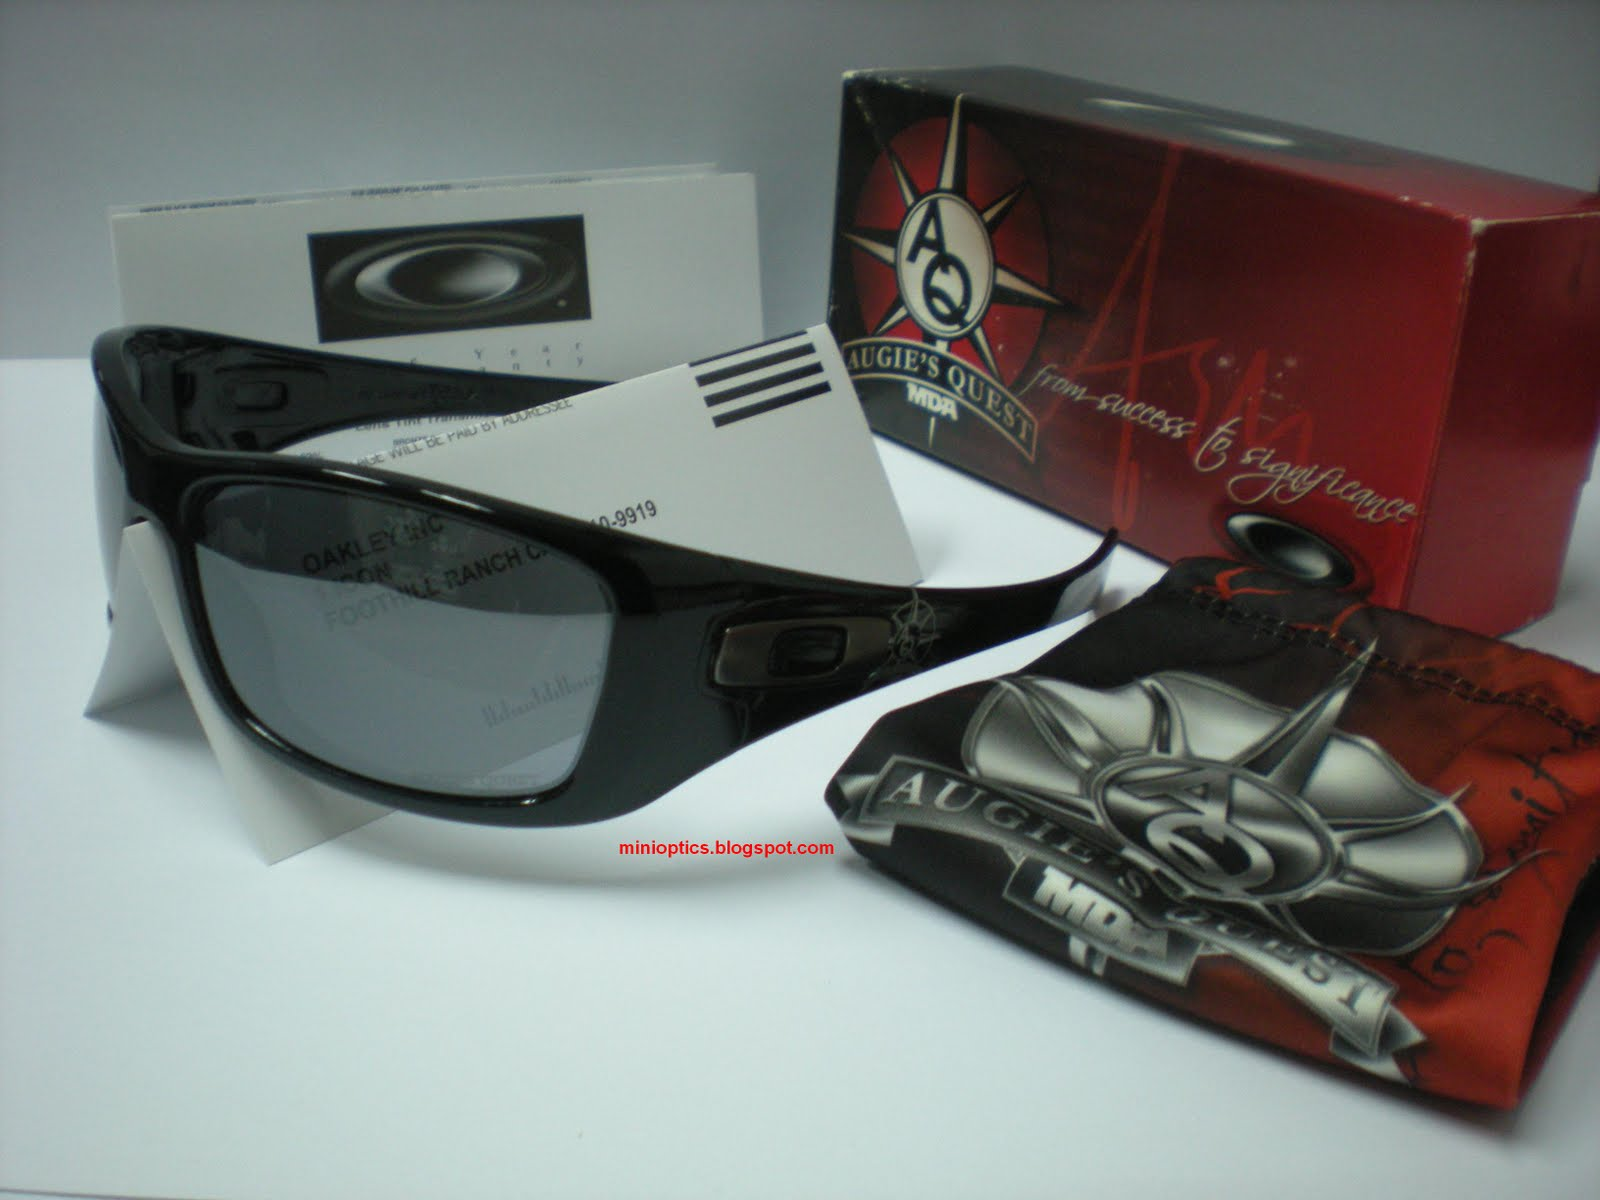 ... Oakley Hijinx Augies Quest Signature Series. SKU 24-053. Polished Black  frame with Black ... 353f9c0f94b